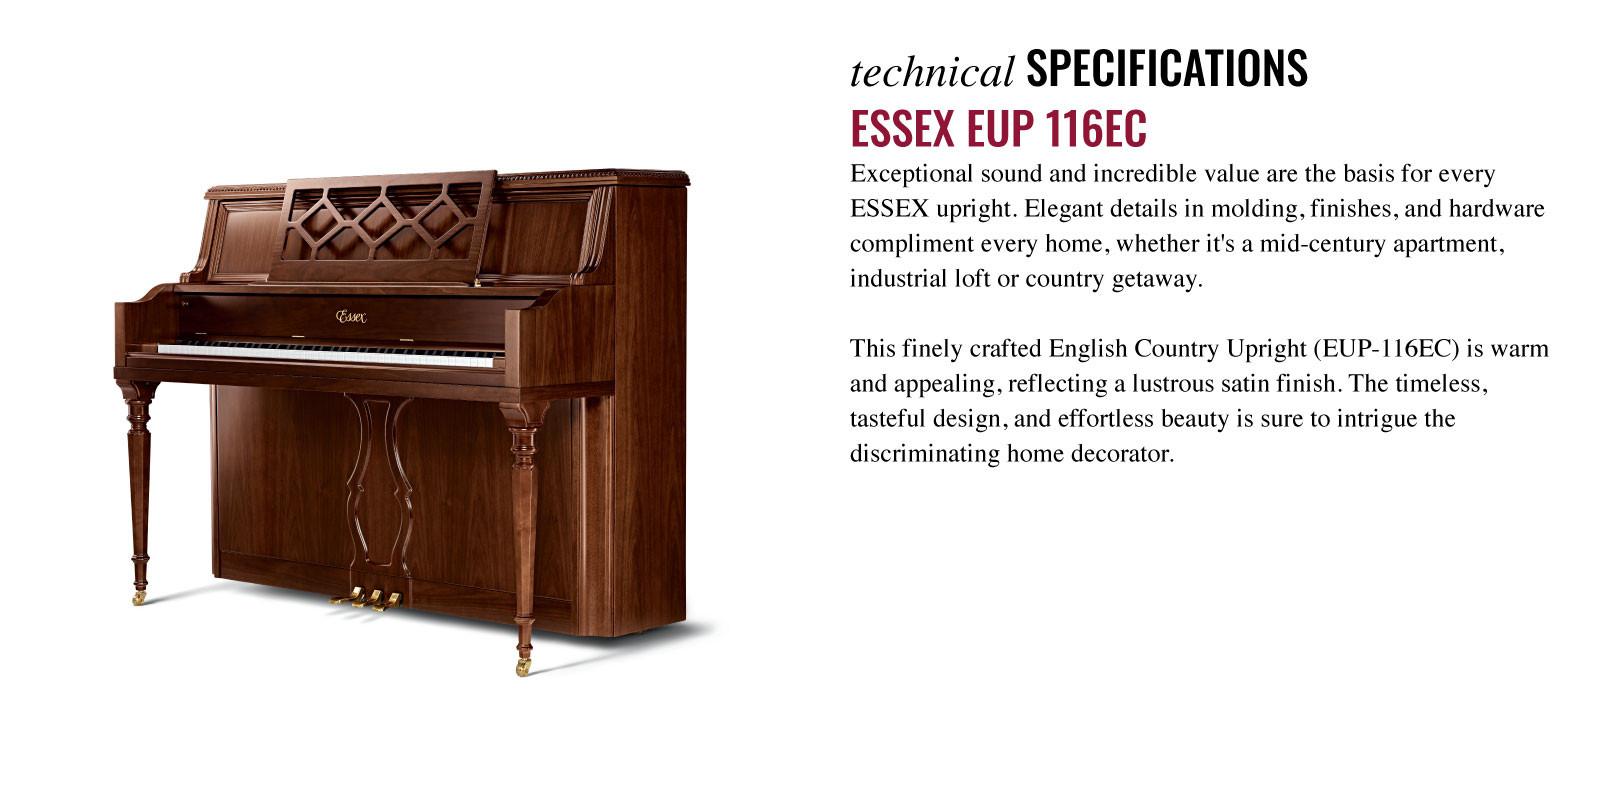 PP-Essex-EUP-116EC-Details-1.jpg